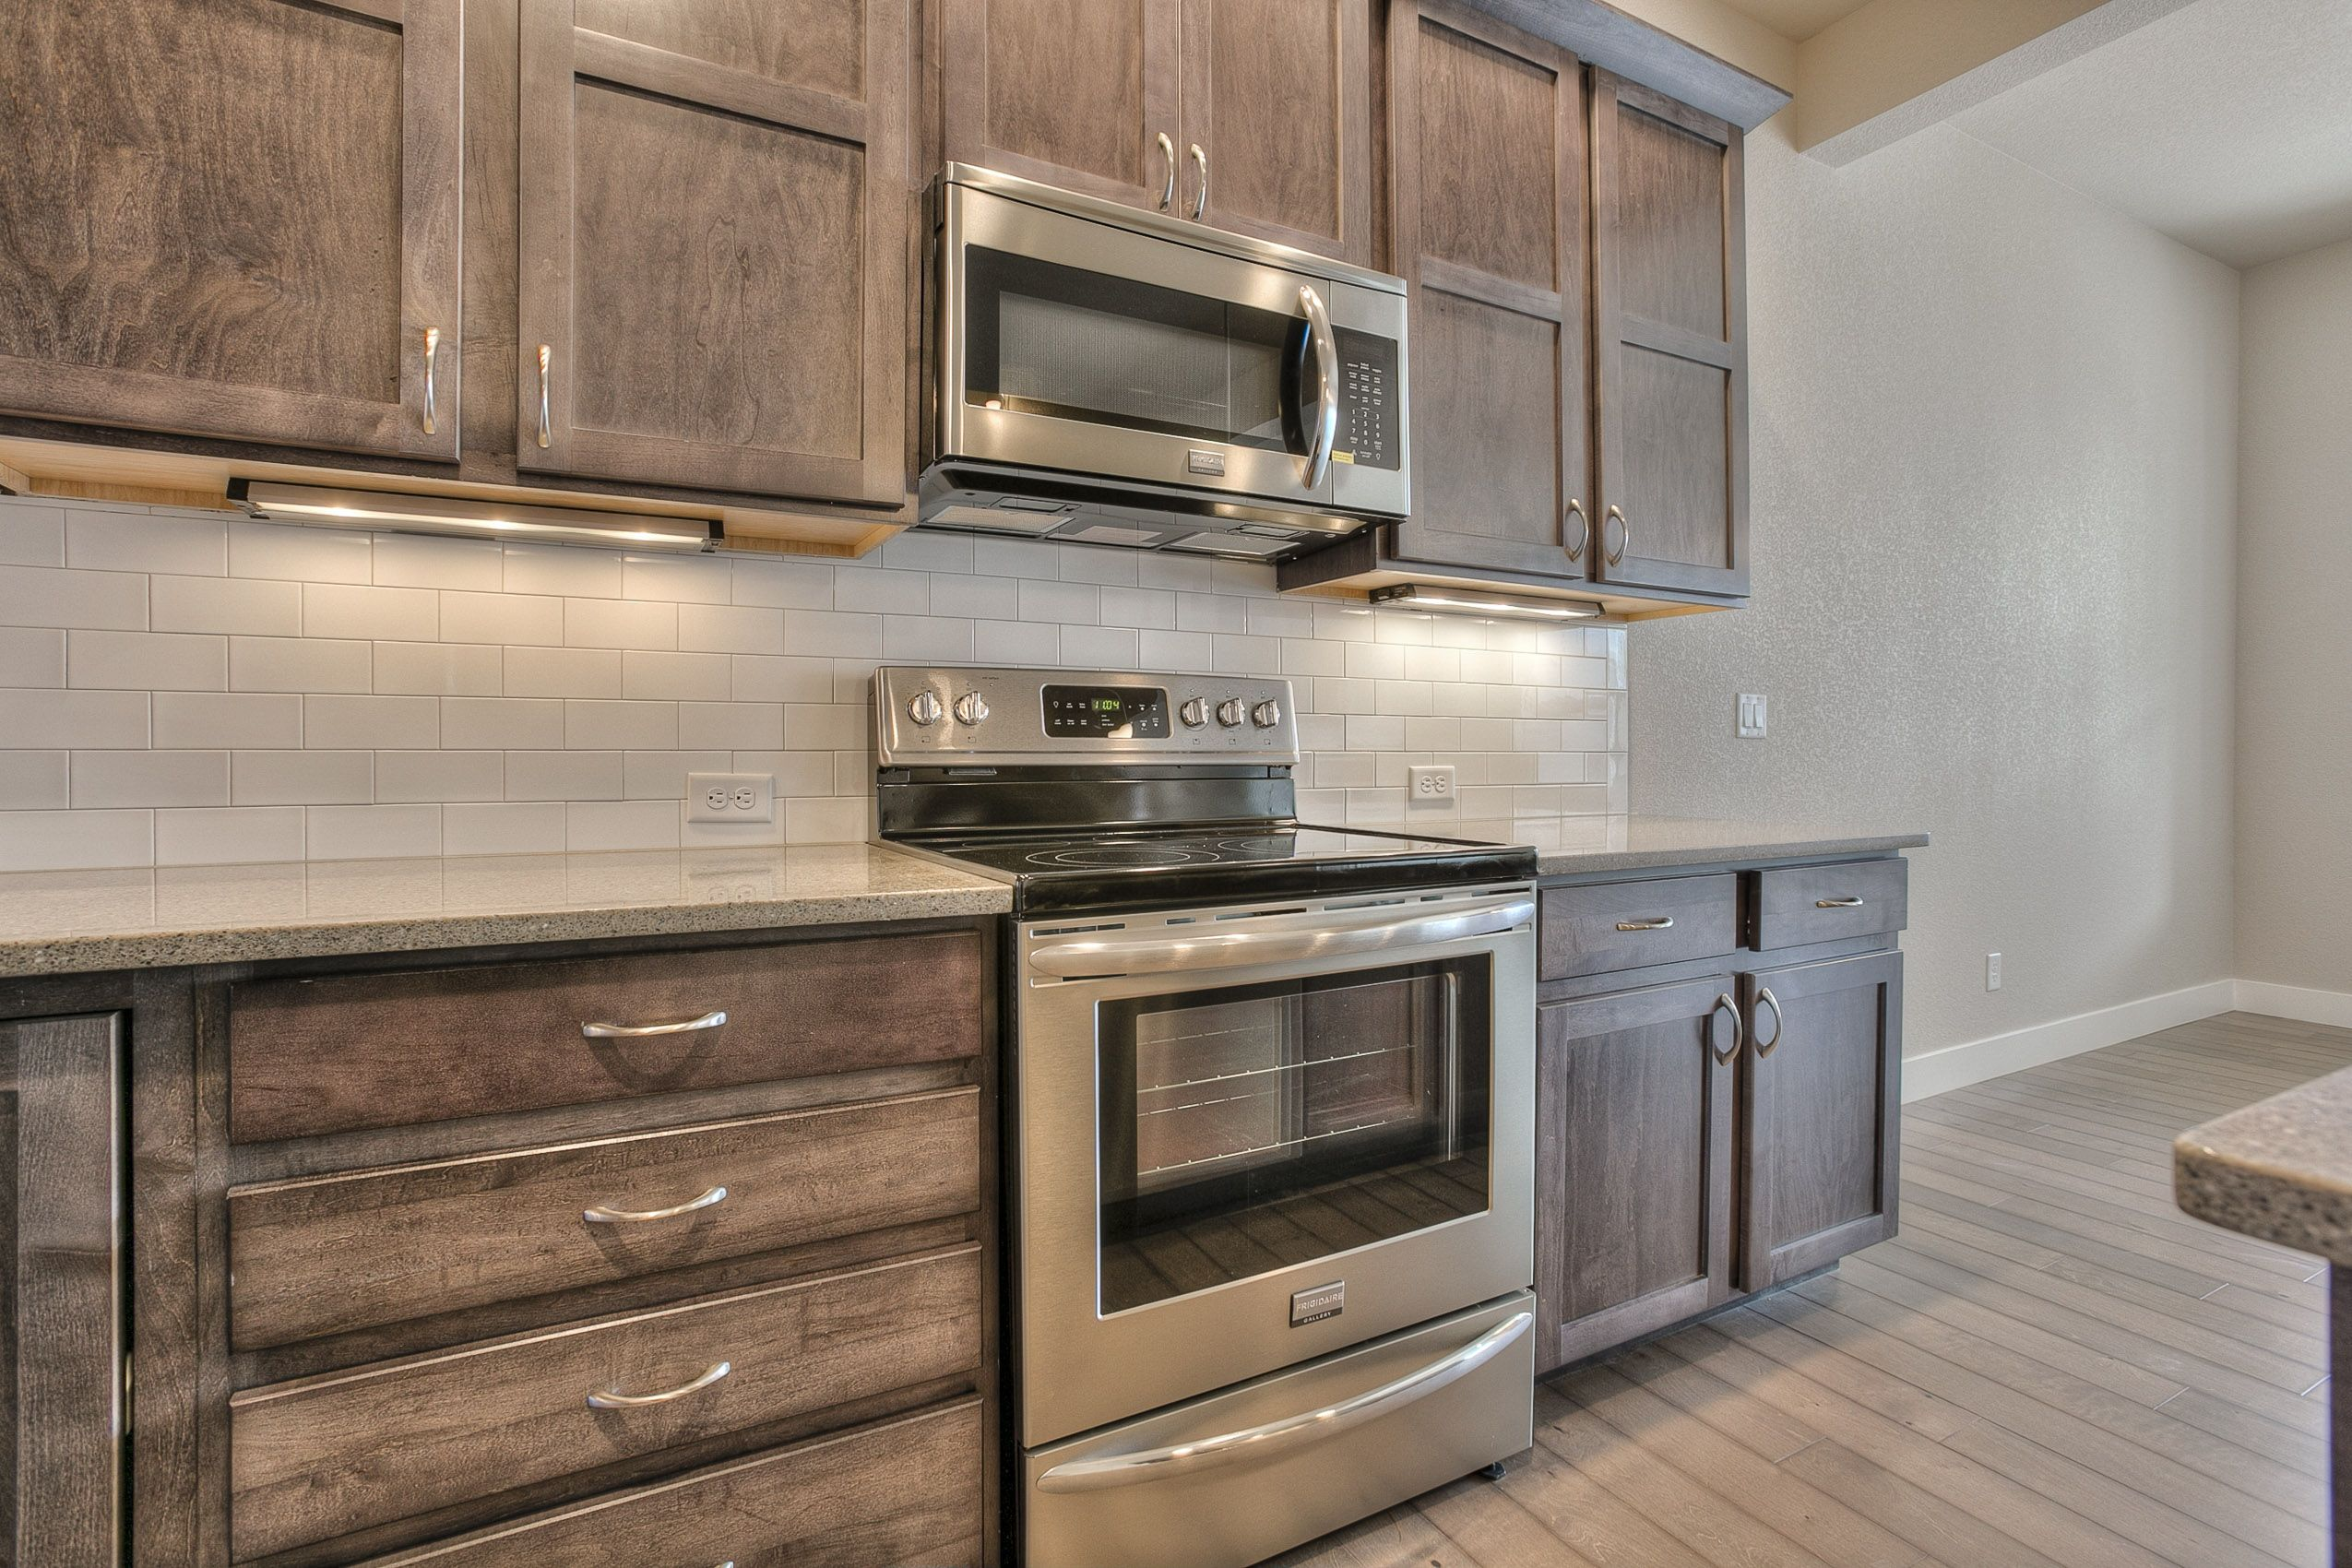 Kitchen | Bathrooms | Graphite Maple Shaker Cabinets ...